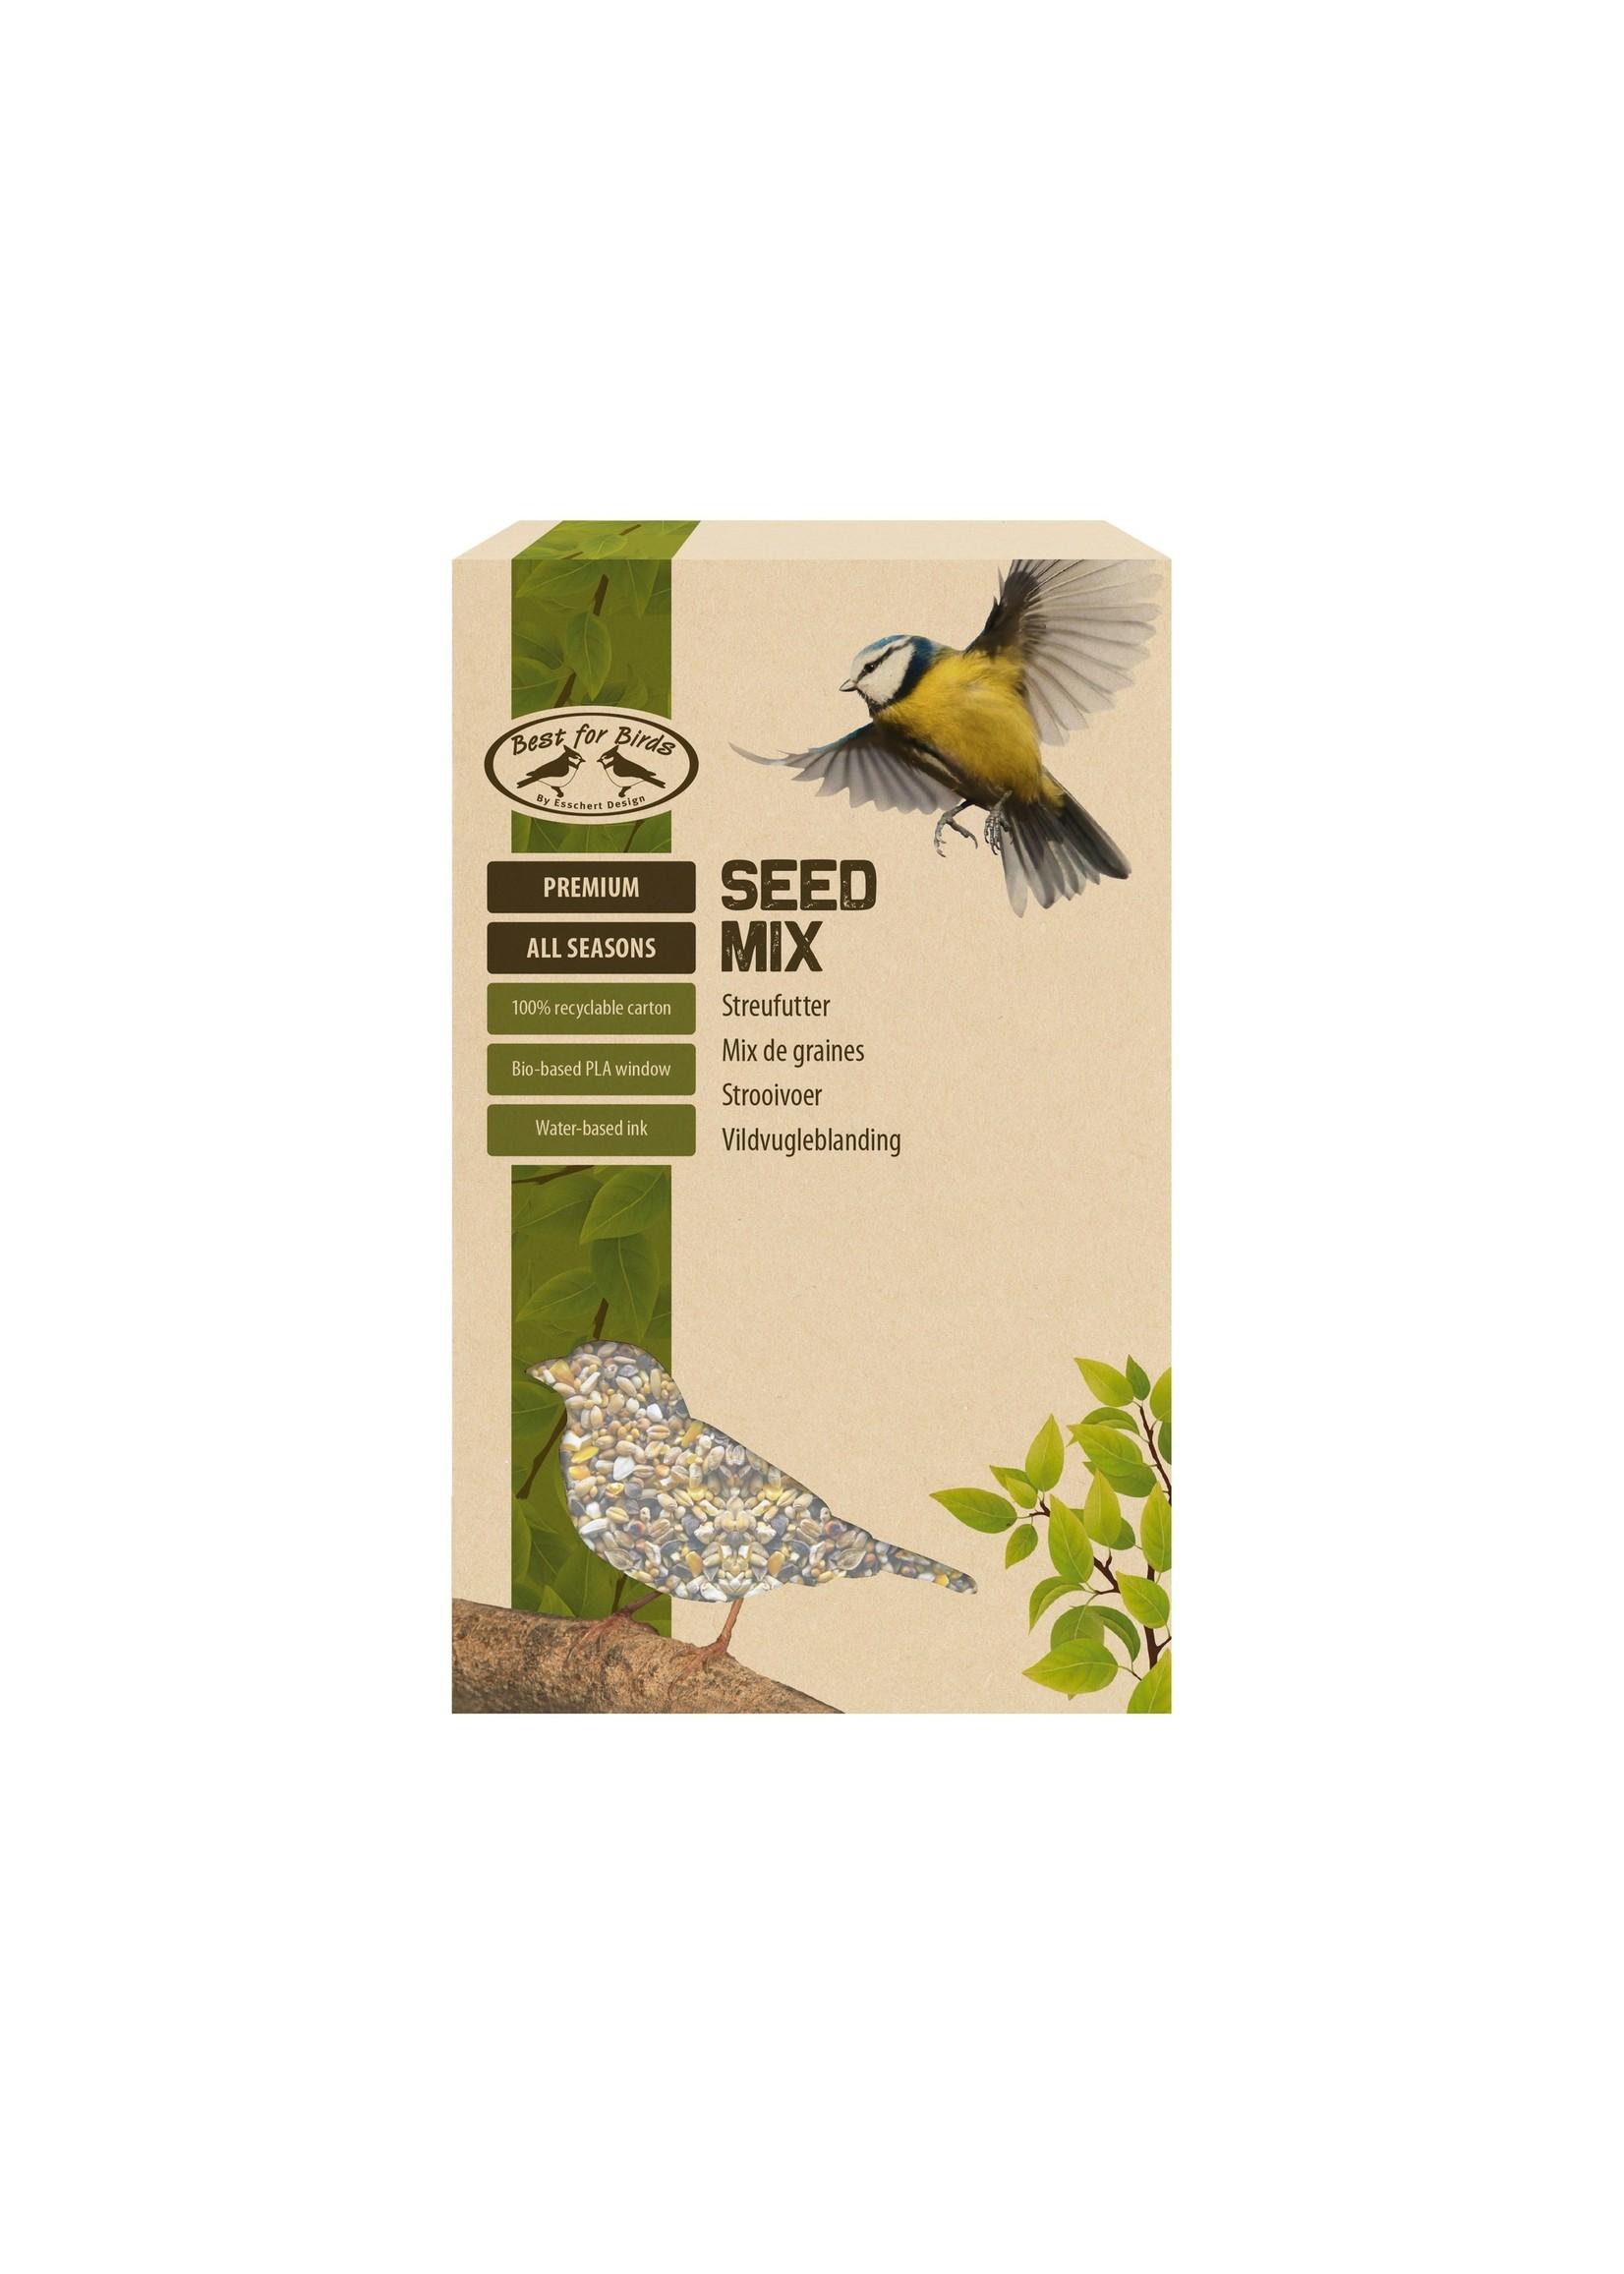 4 Seasons Seed Mix